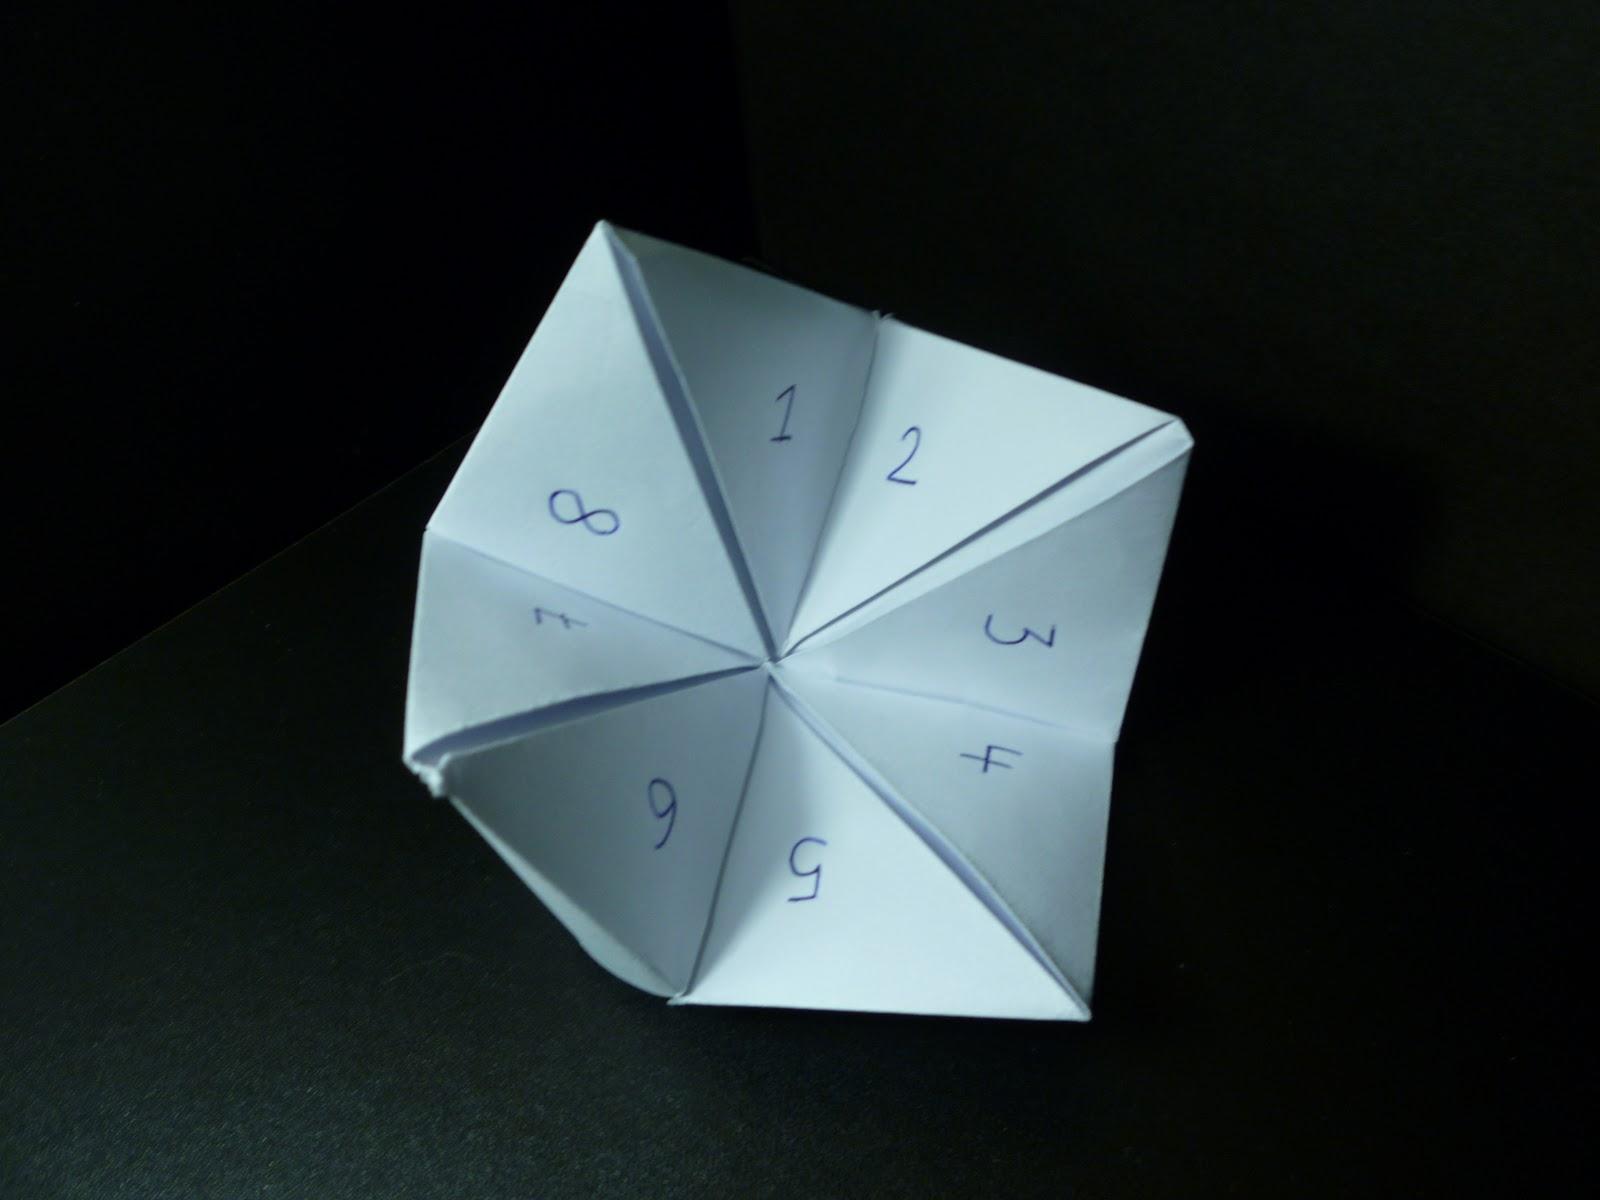 Loren Timms Ba Art Design Hand Made Origami Game